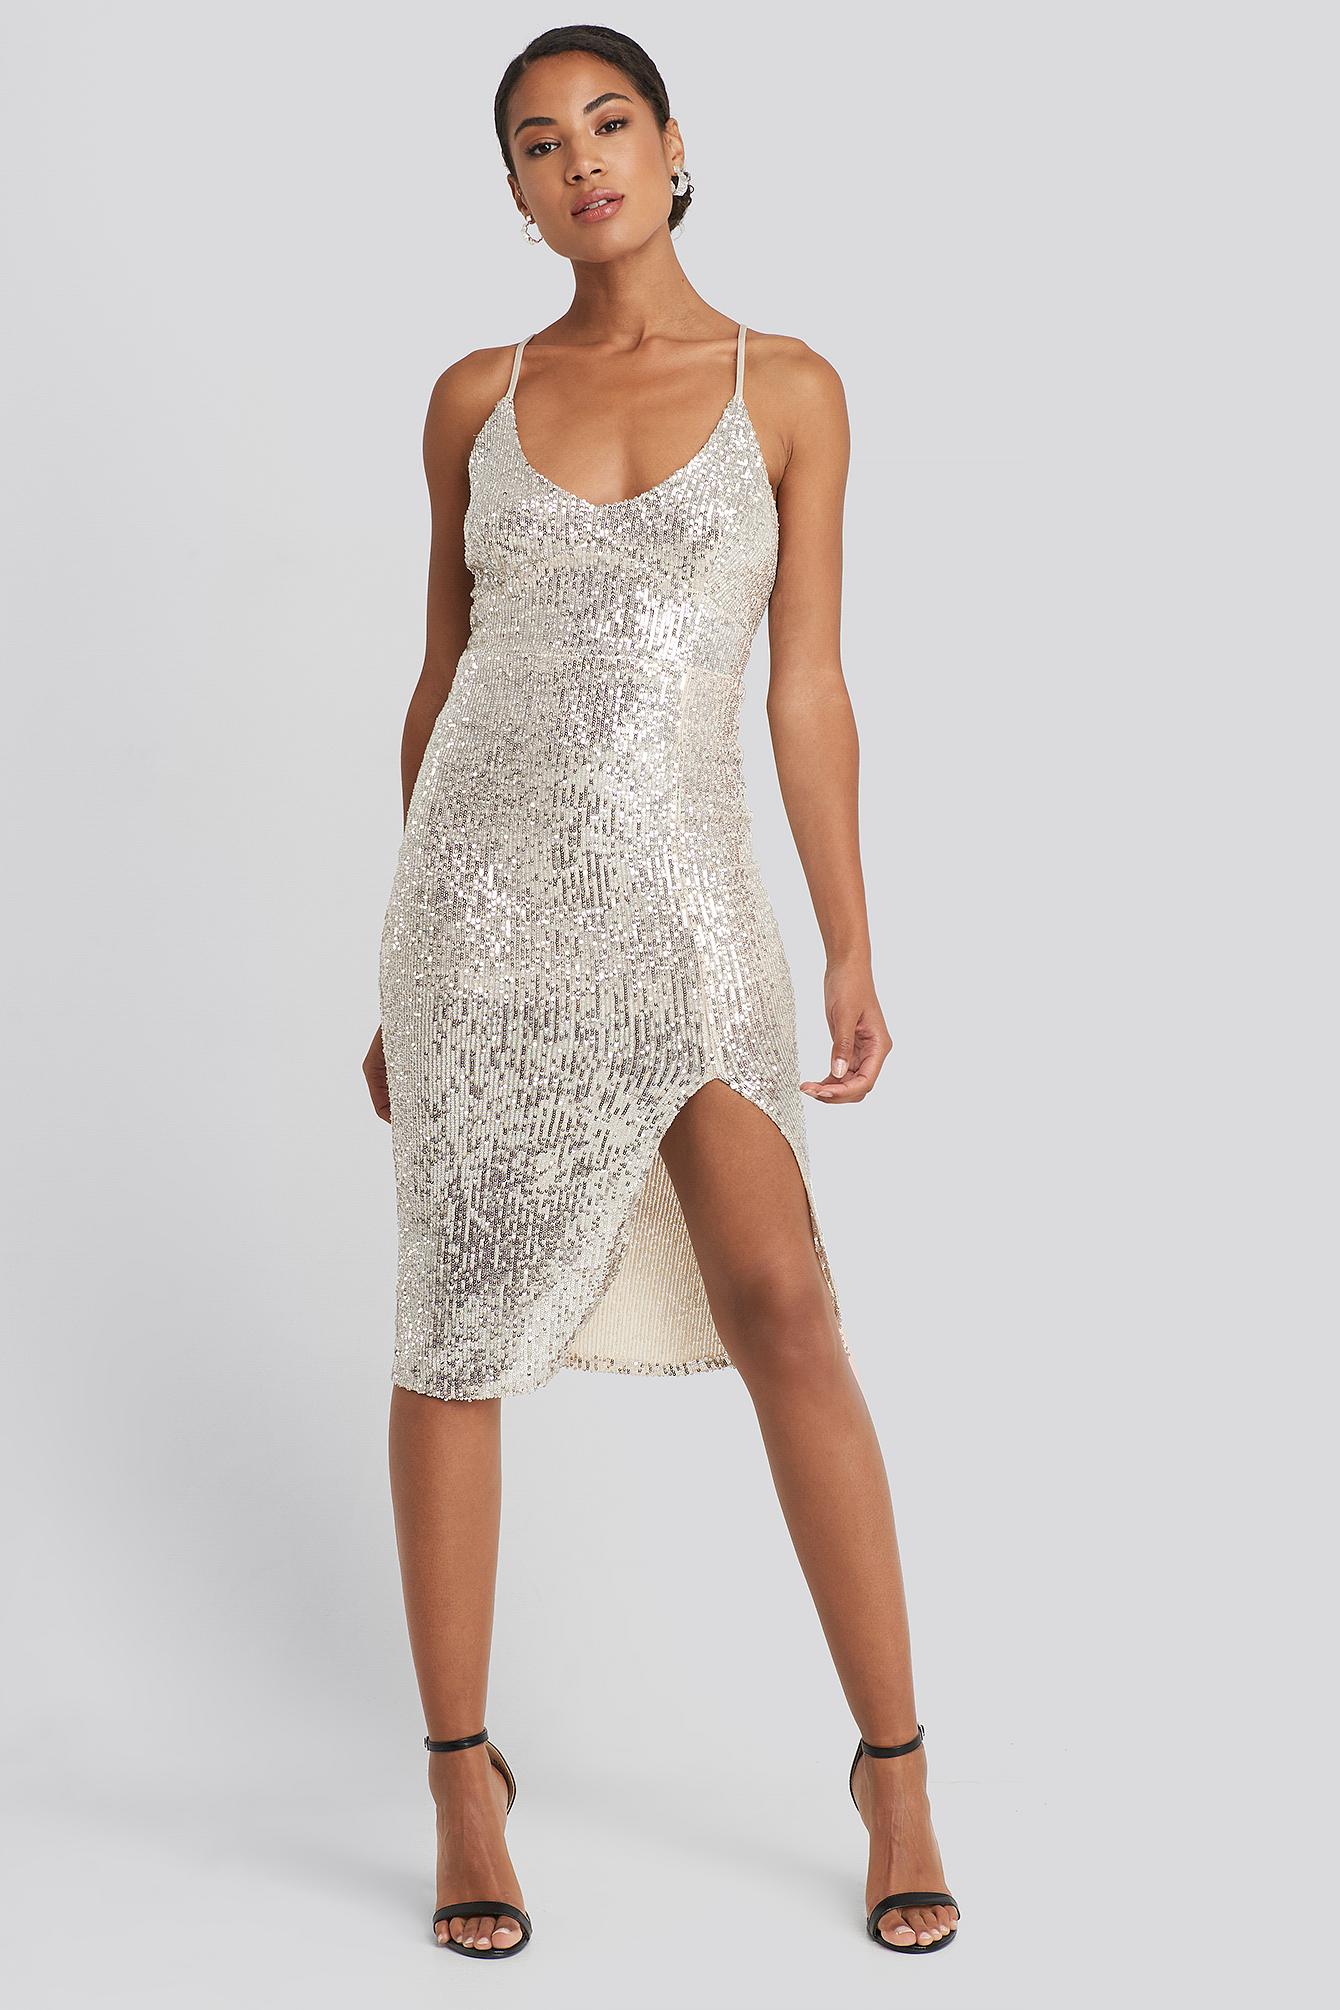 trendyol -  Thin Strap Back Detailed Sequin Midi Dress - Silver